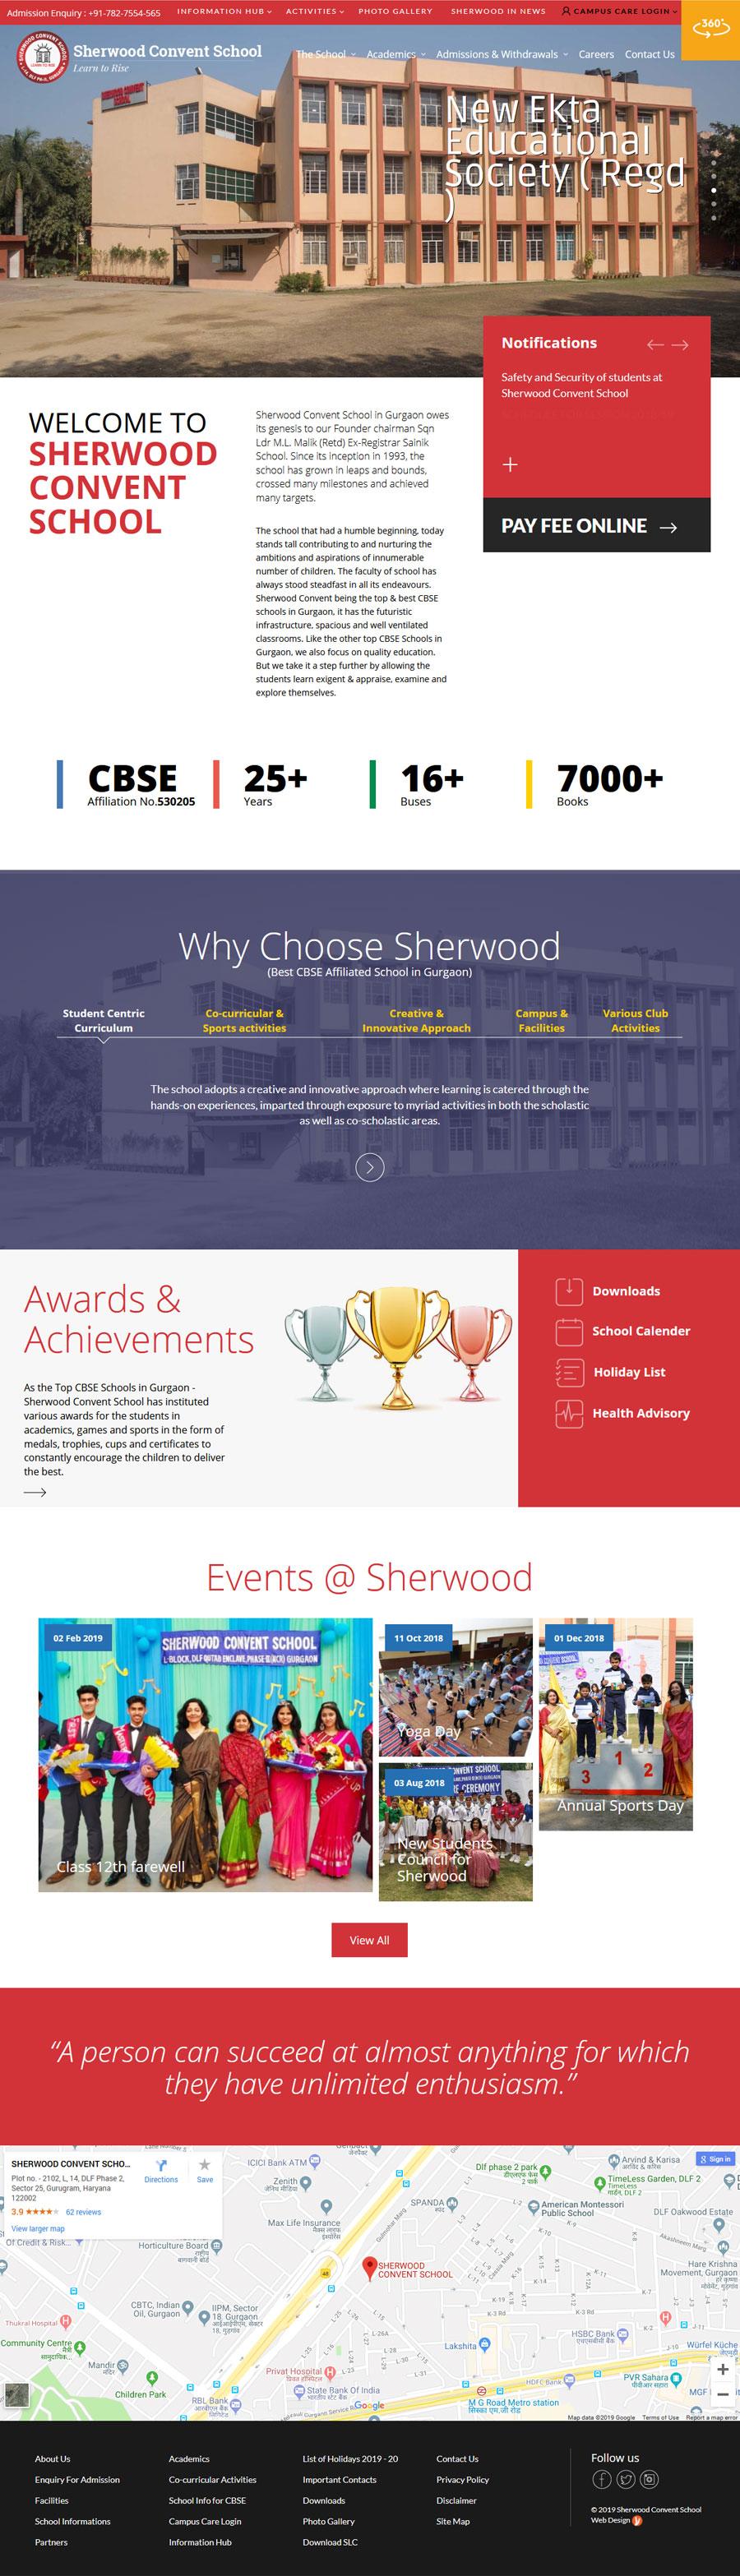 Sherwood Convent School